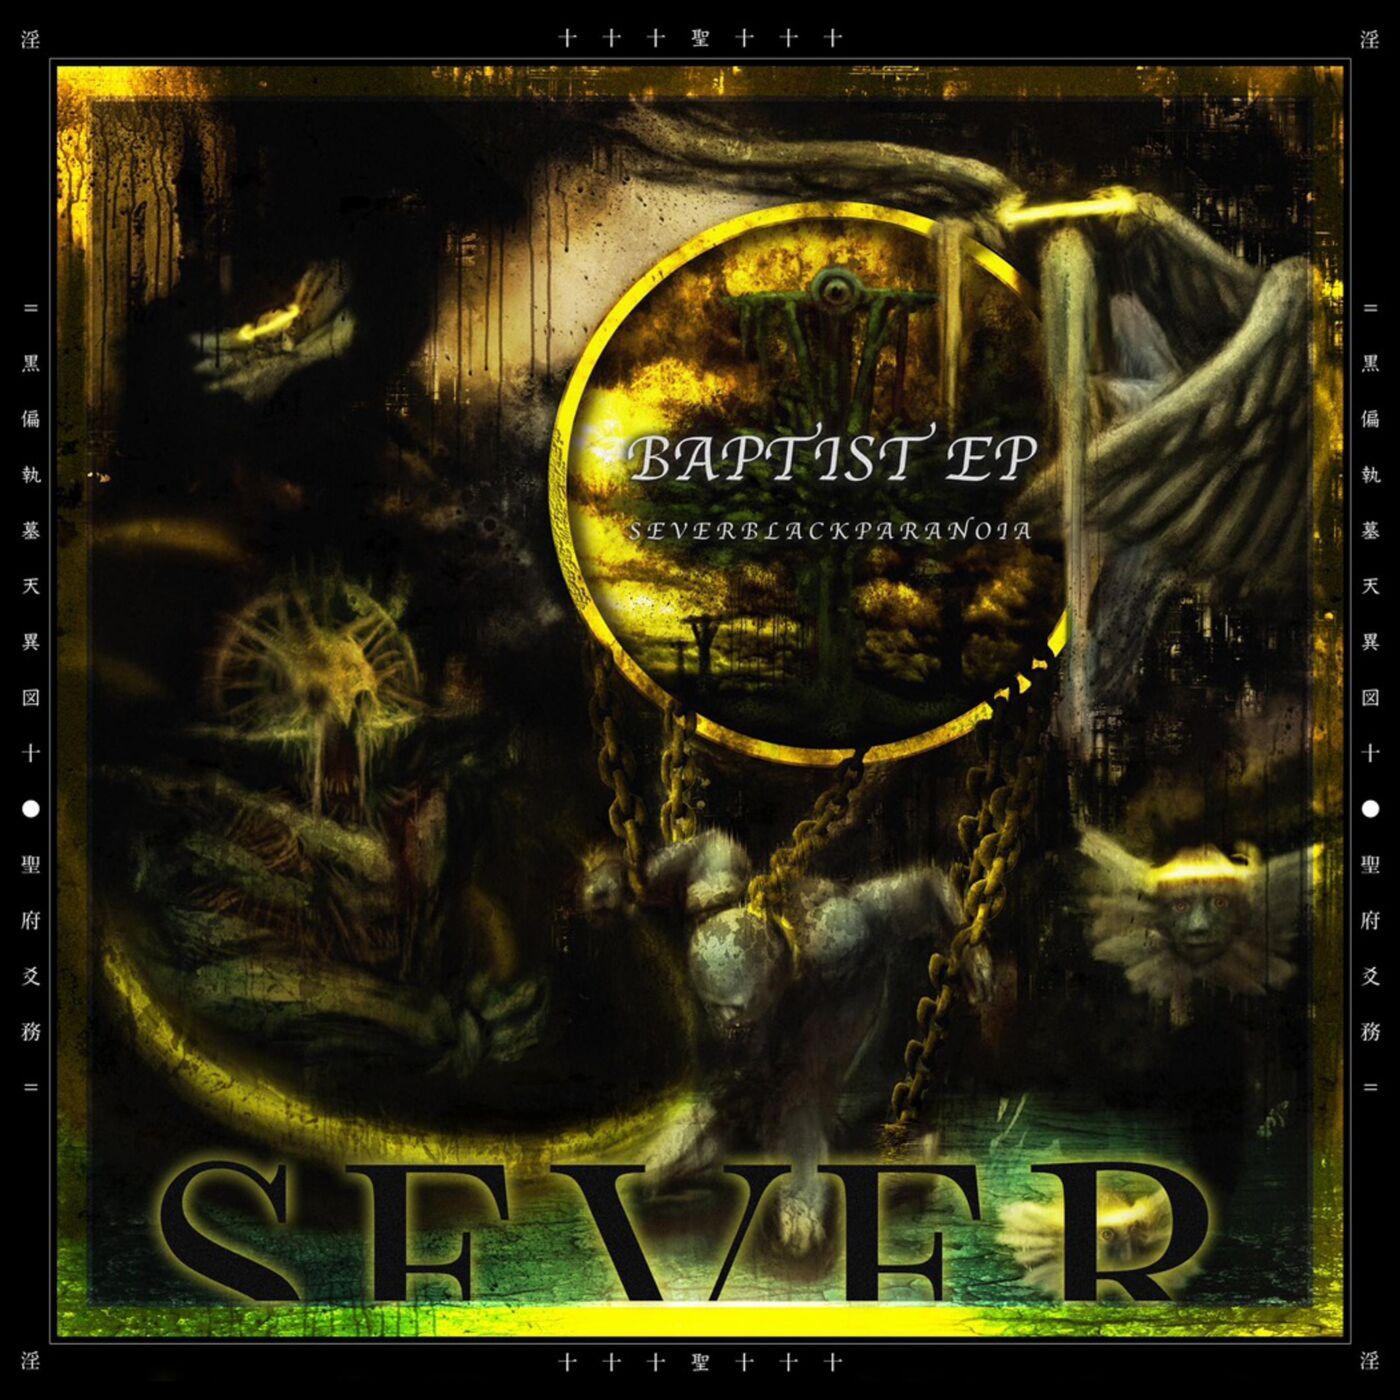 Sever Black Paranoia - BAPTIST [EP] (2019)